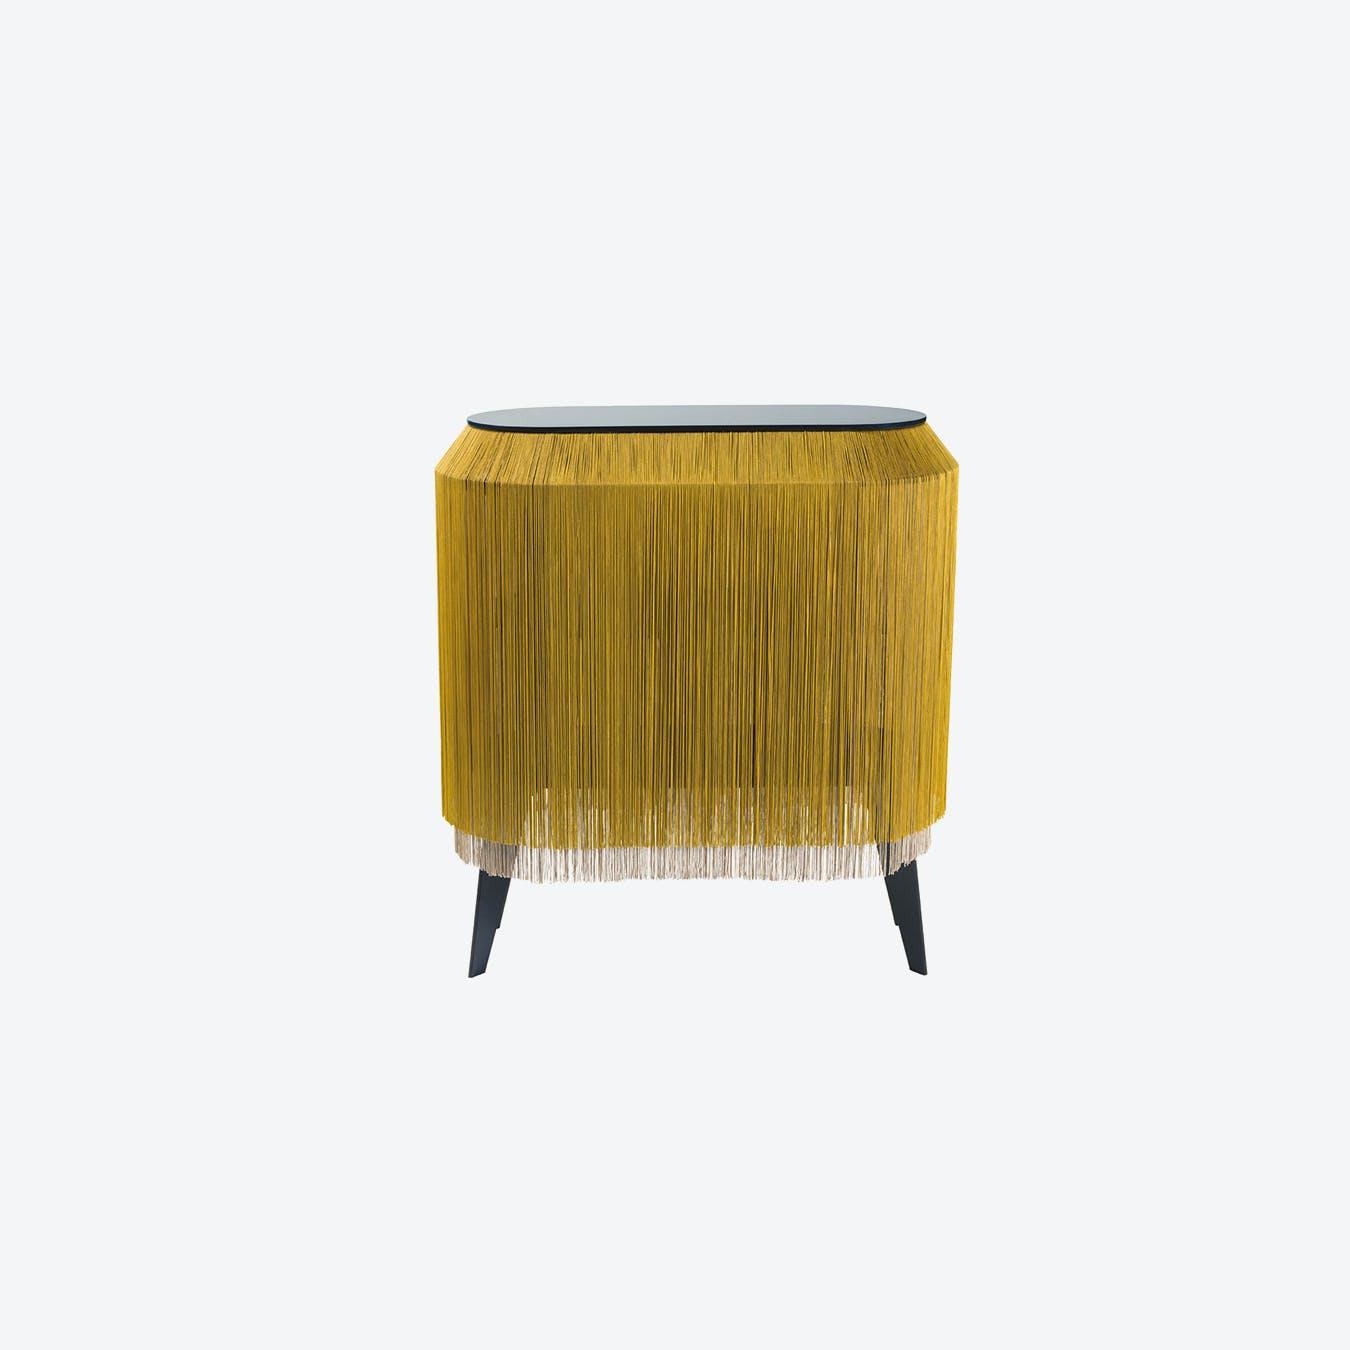 BABY ALPAGA Beside Cabinet - Chic Gold